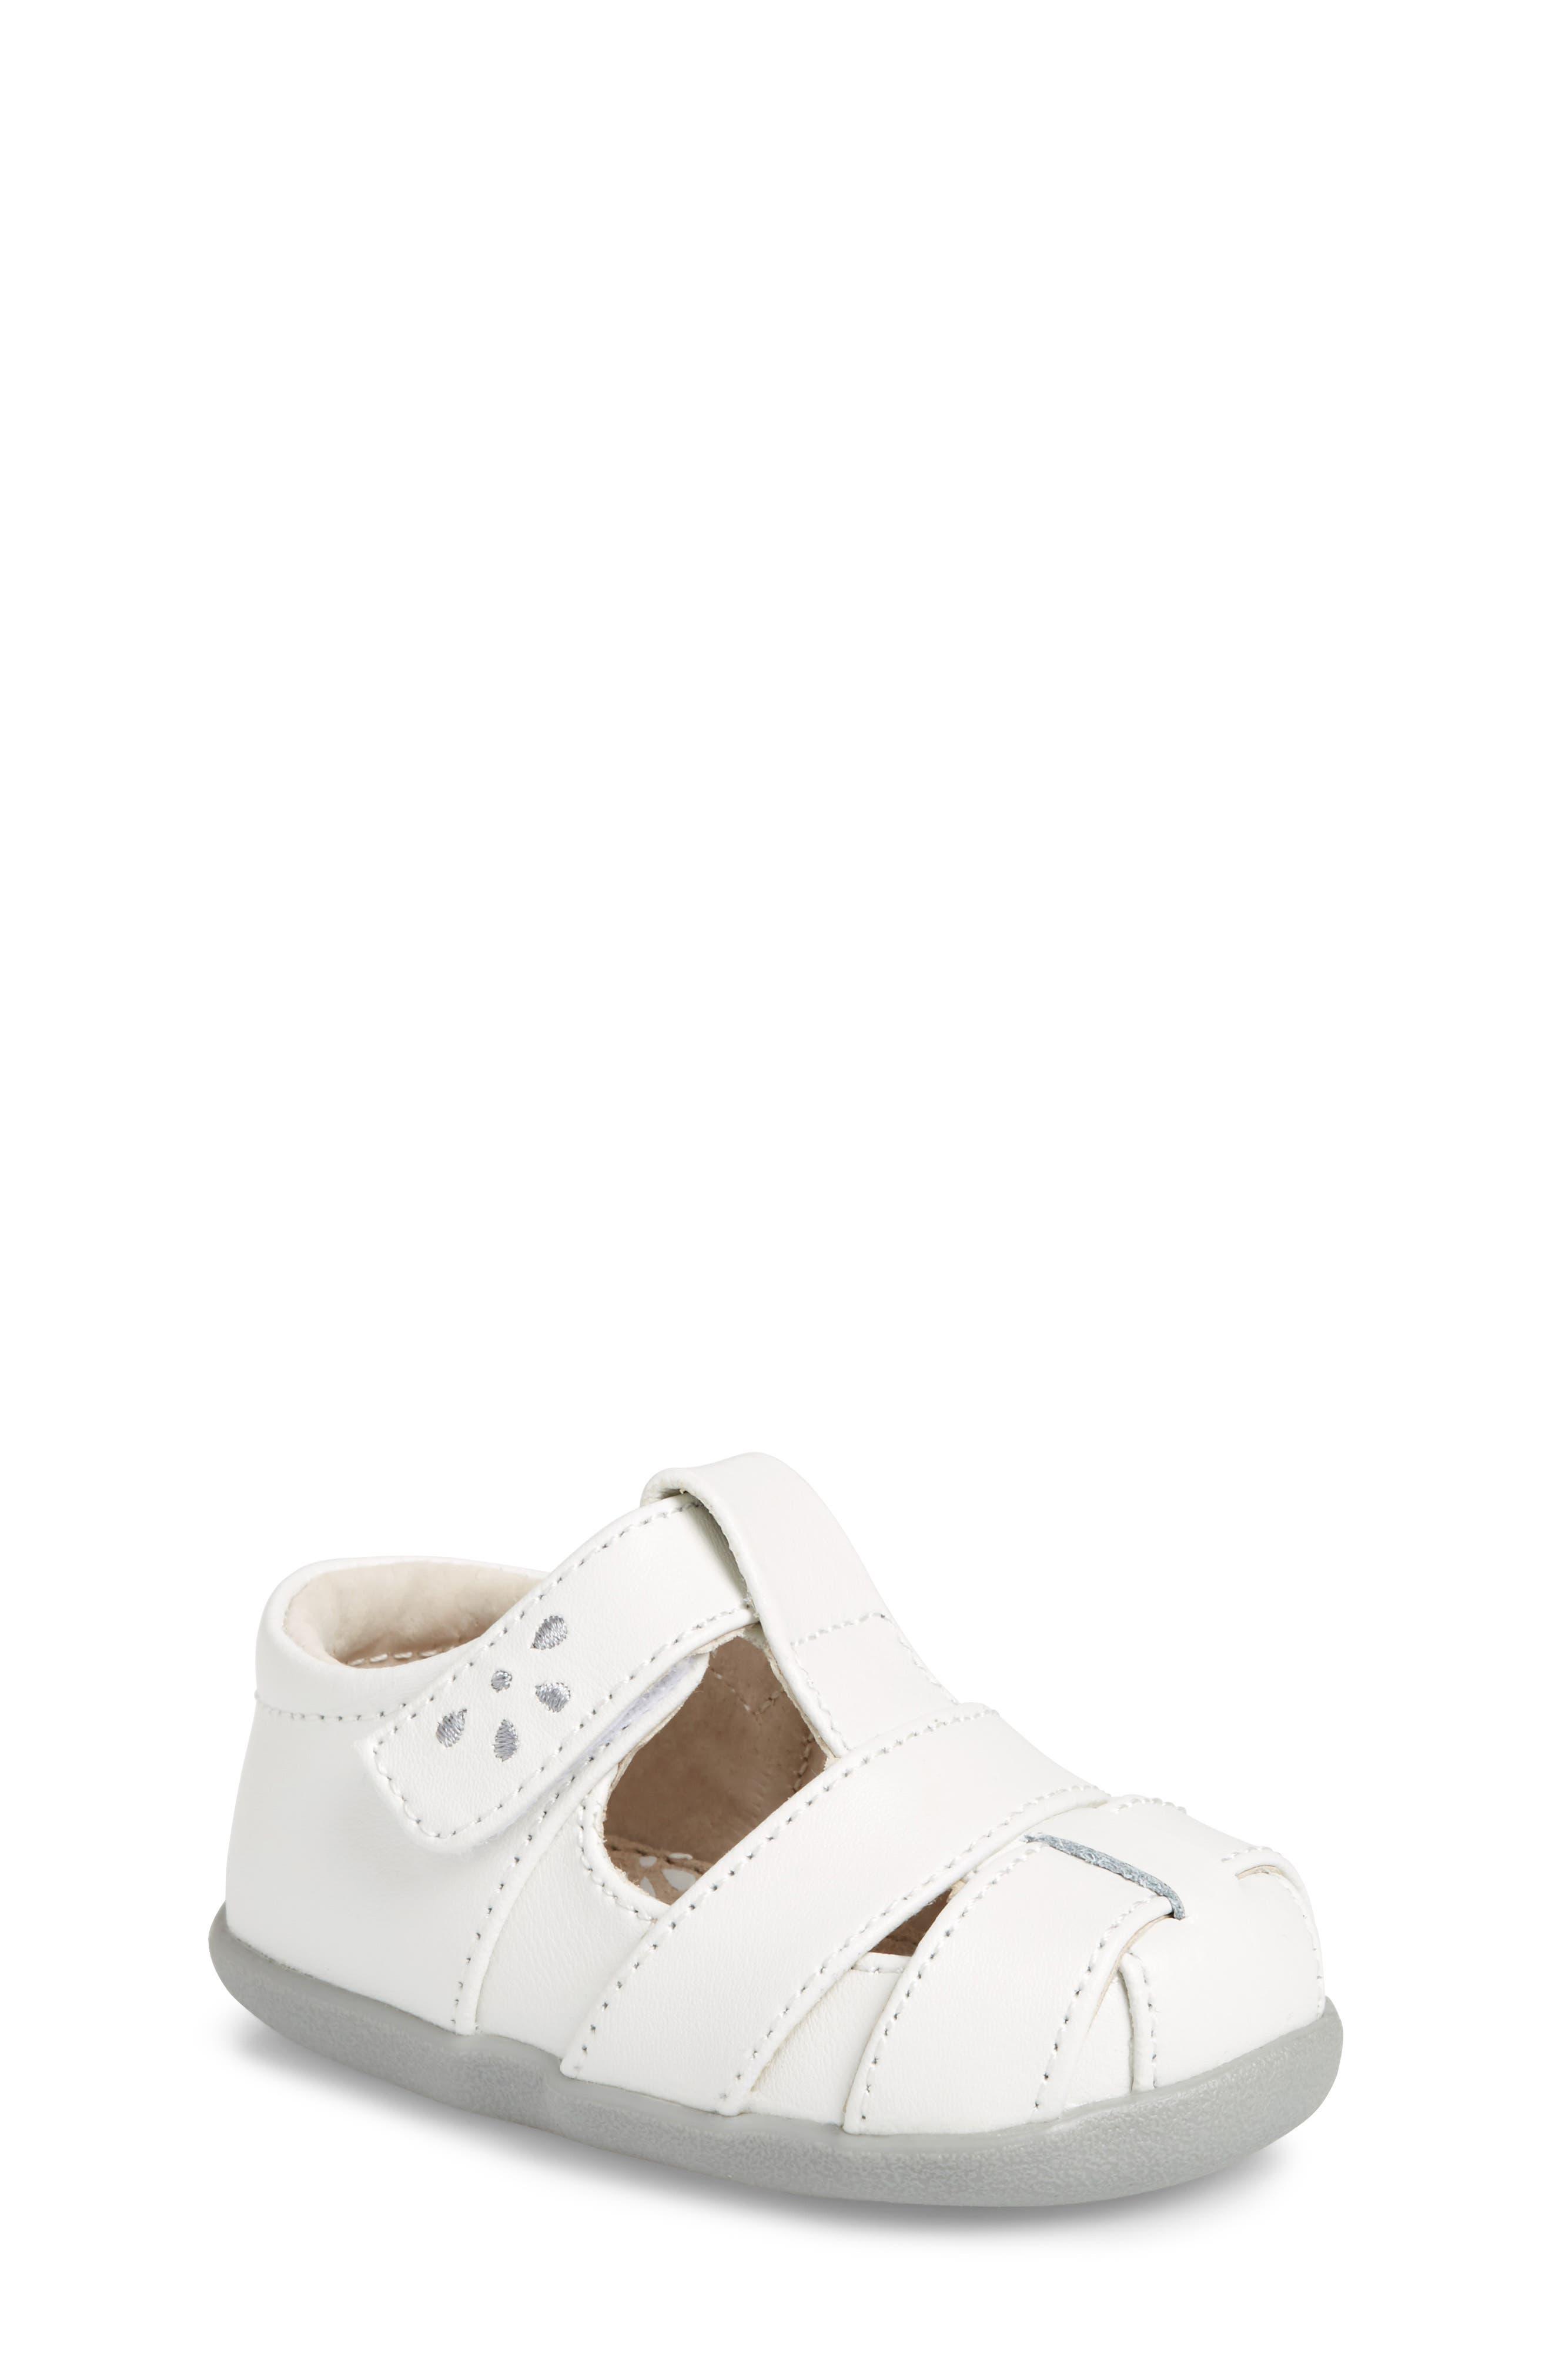 See Kai Run Brook III Sandal (Baby & Walker)